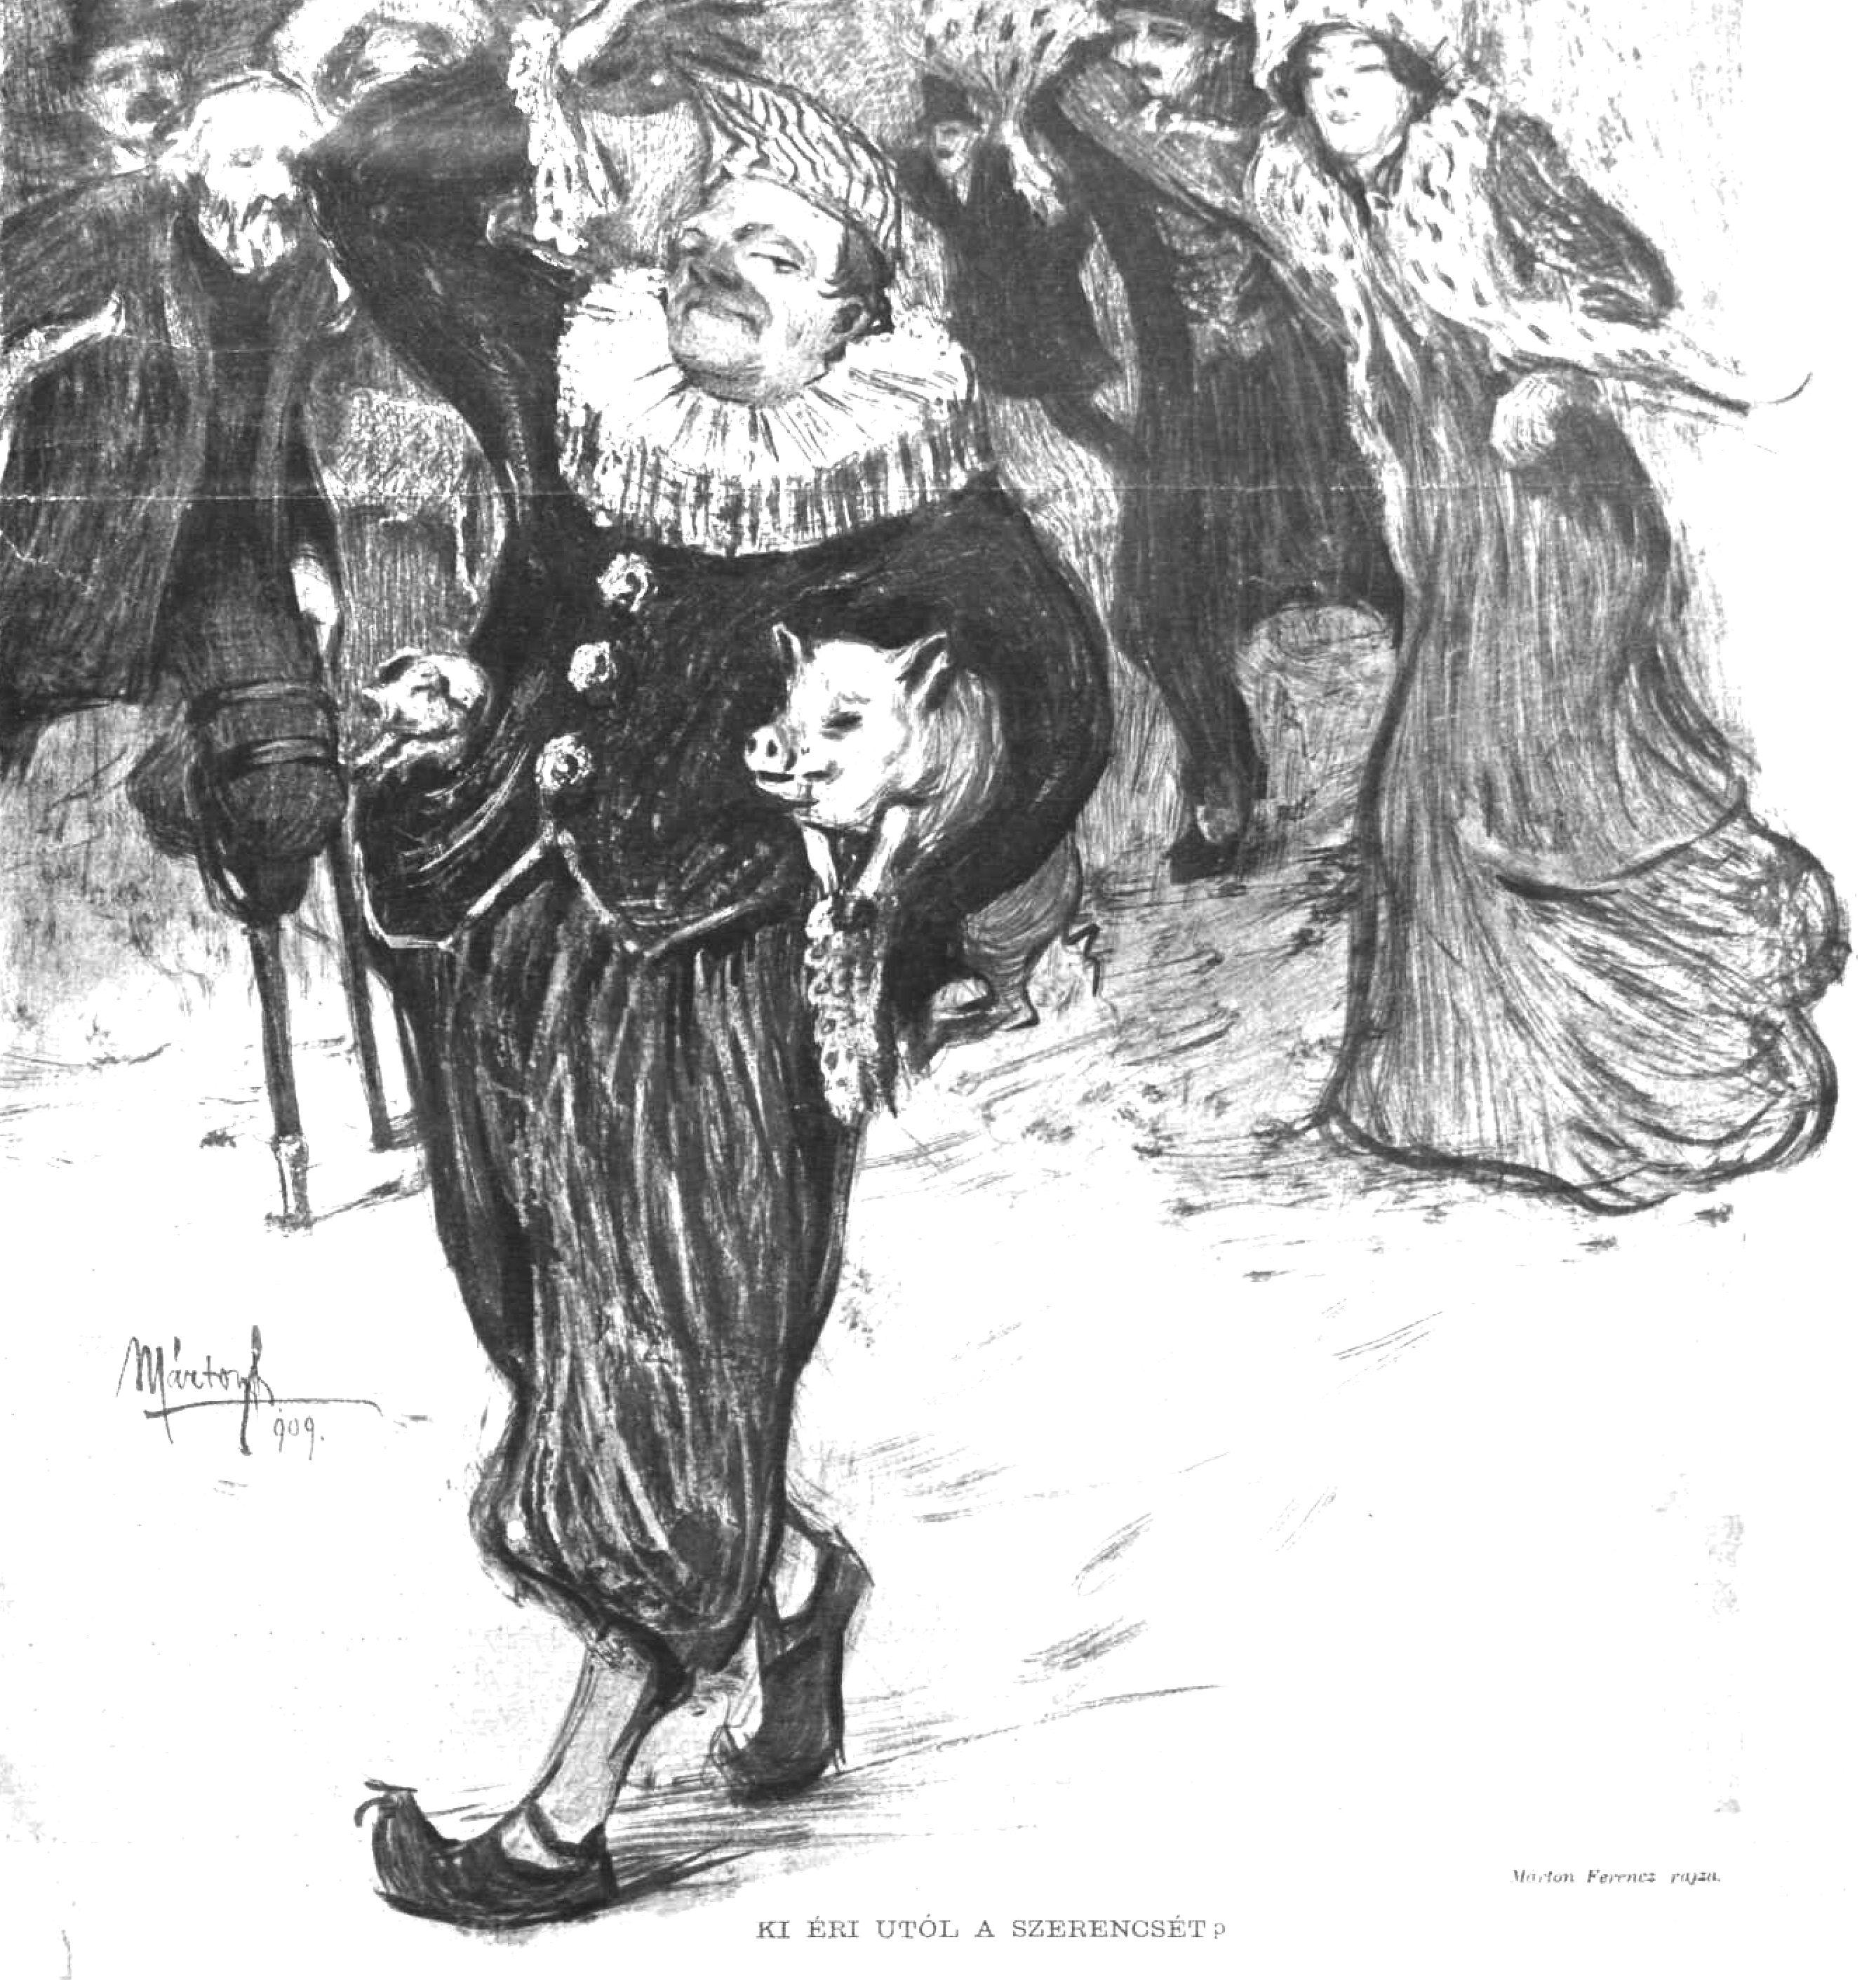 1910vu_epa00030_1910_01-page-001.jpg